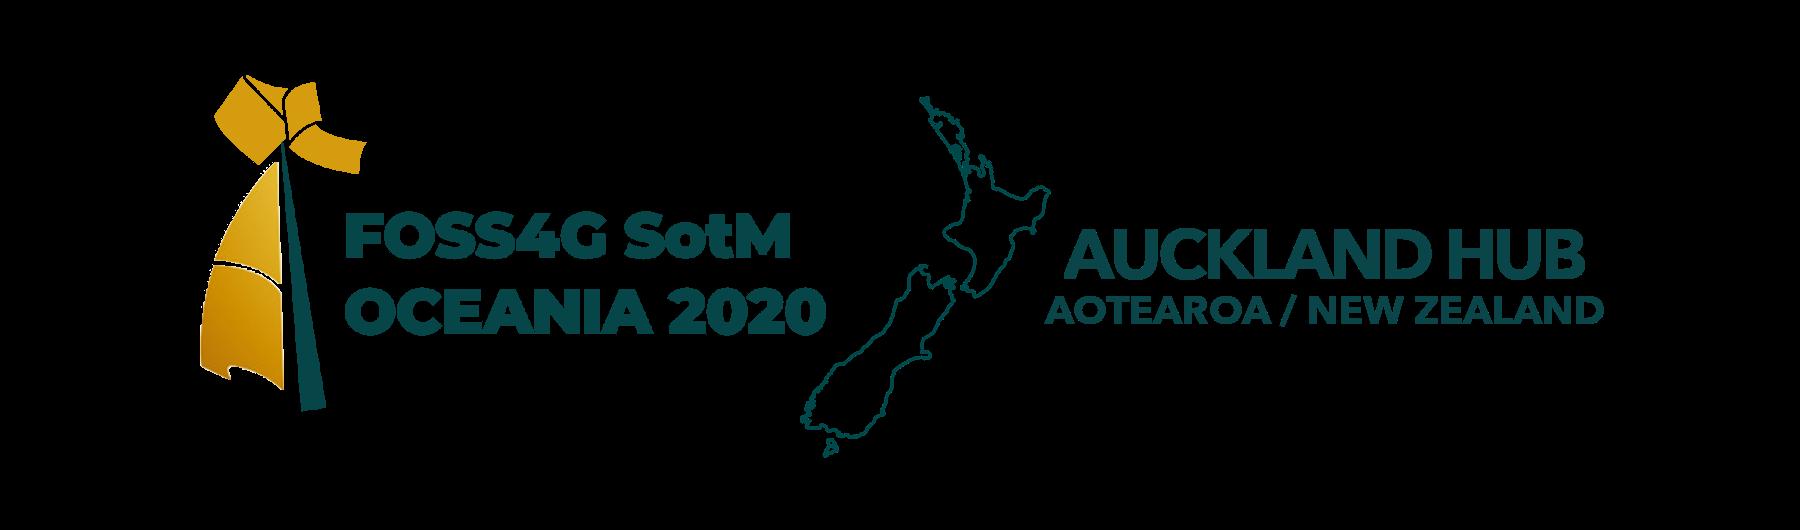 FOSS4G SotM Oceania 2020 - Auckland Hub